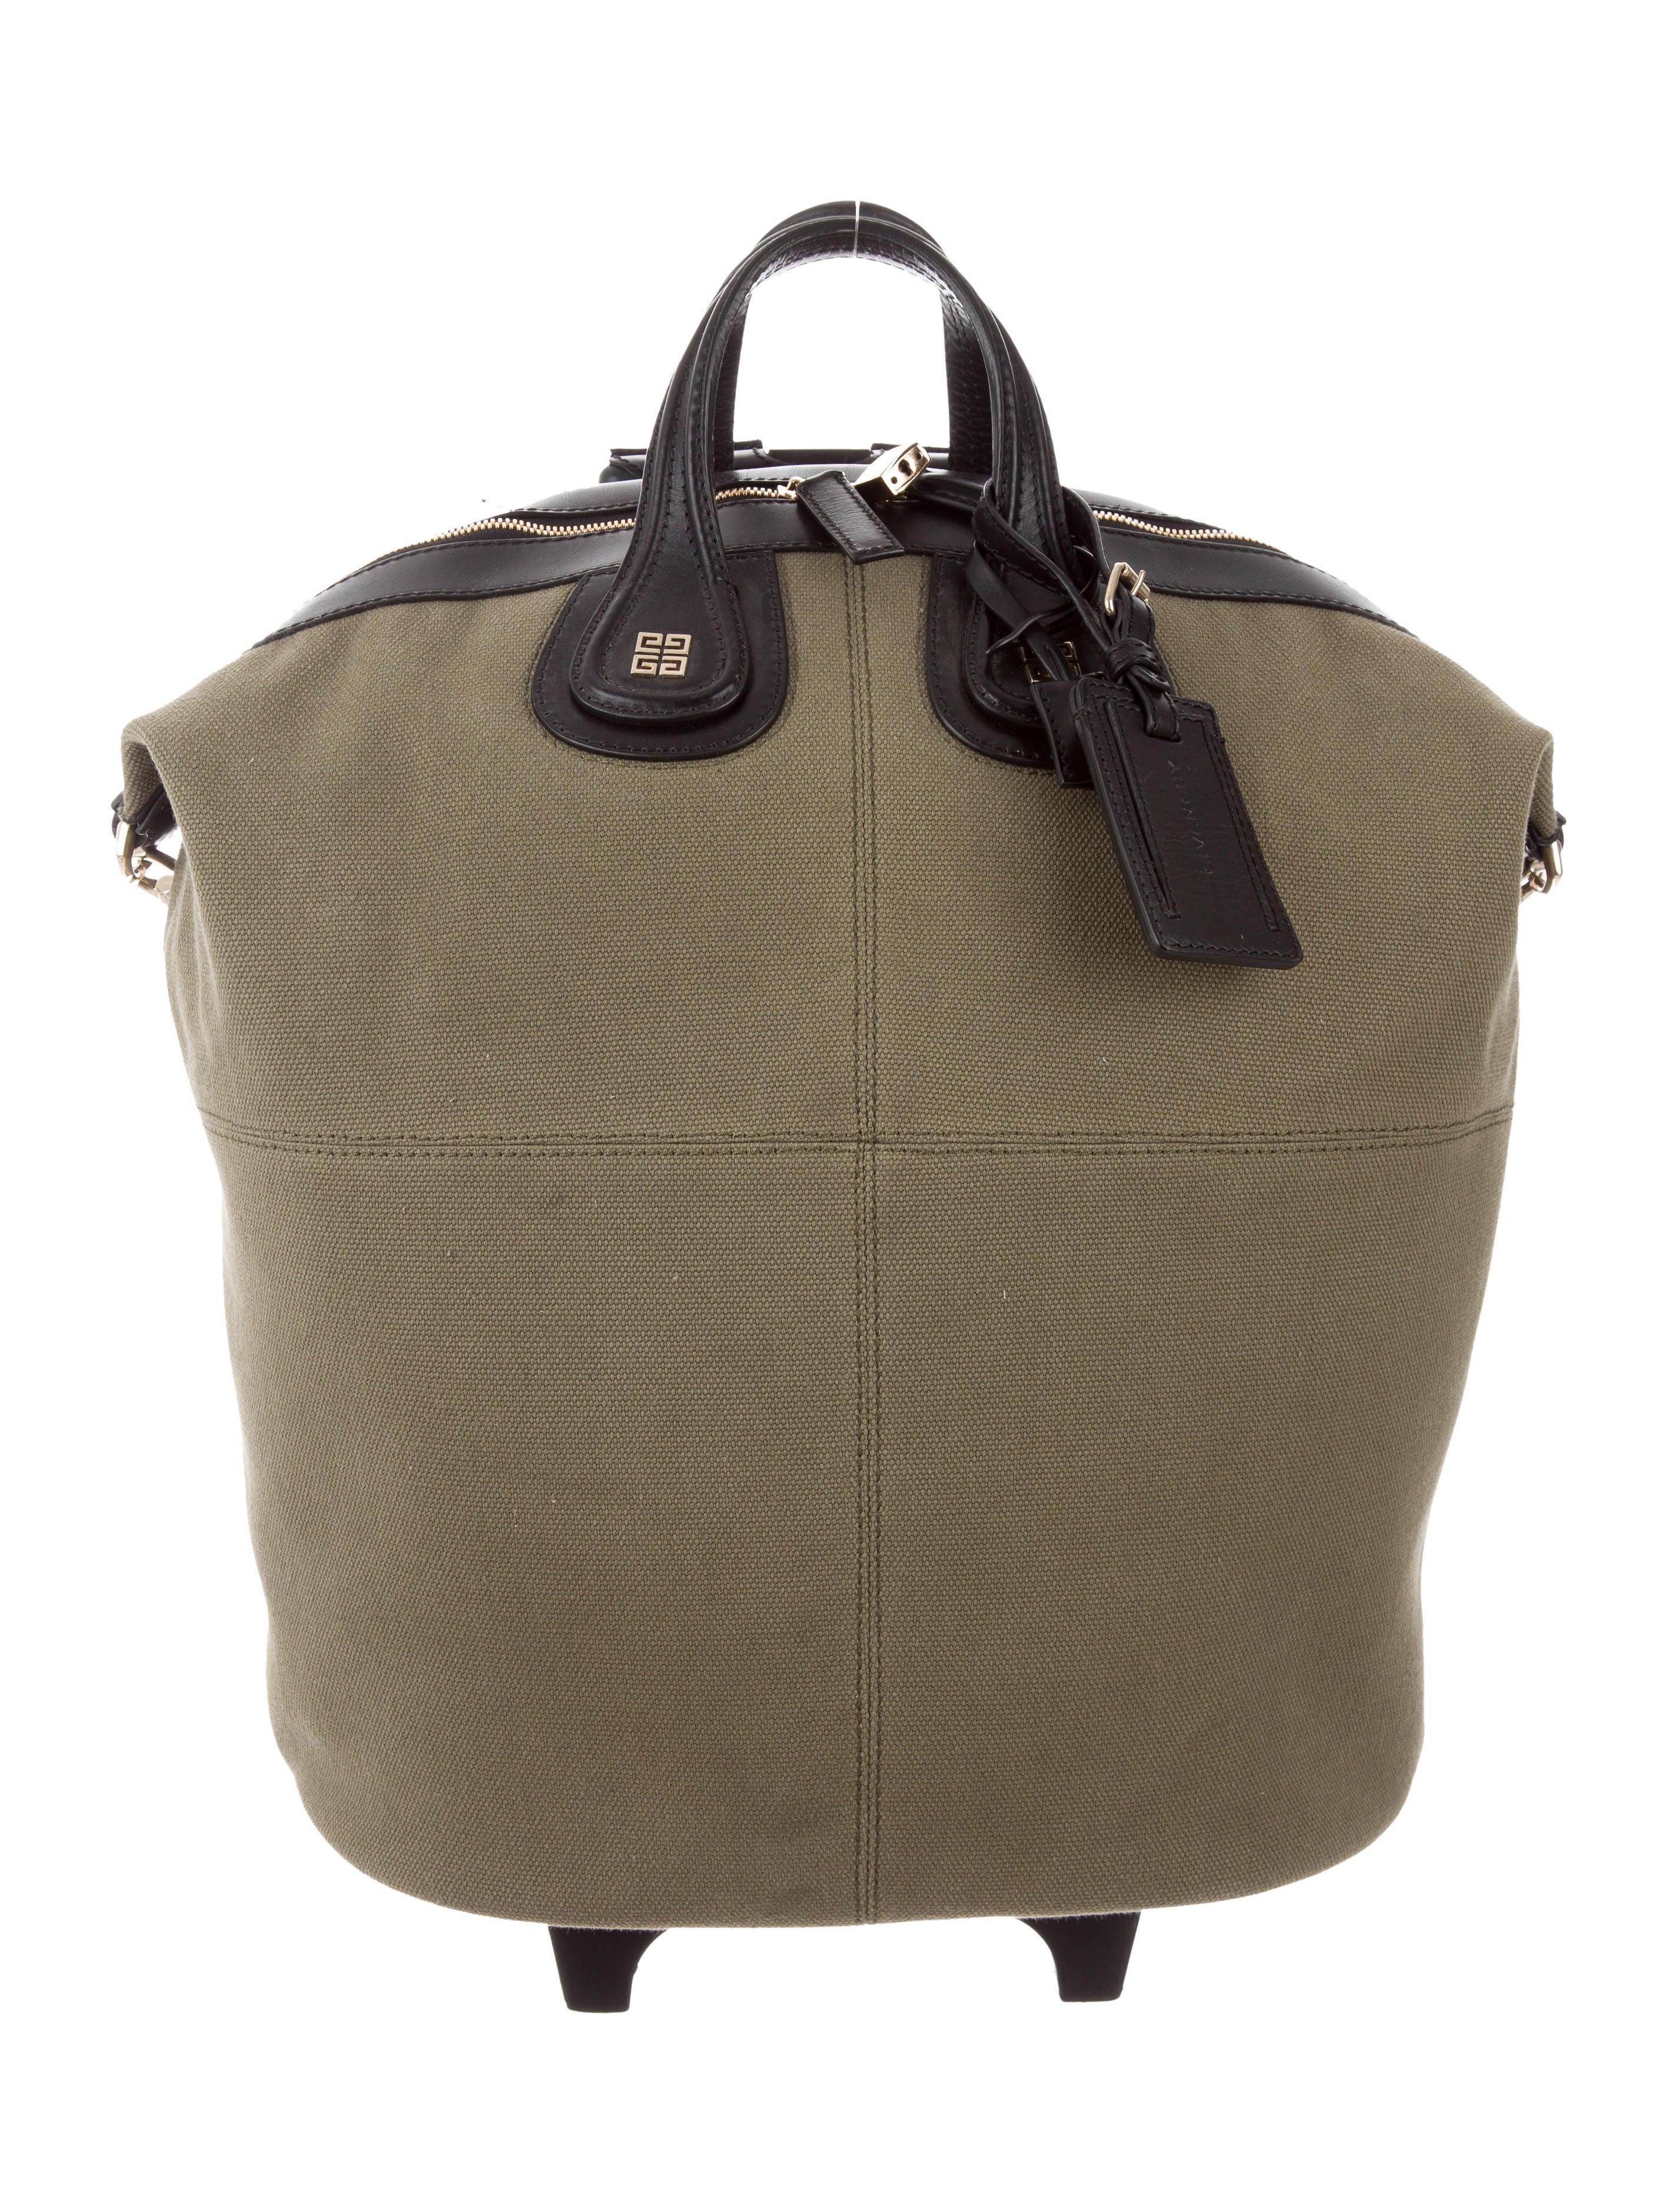 7496a170c9d2 Givenchy Nightingale Trolley Bag - Luggage - GIV44242